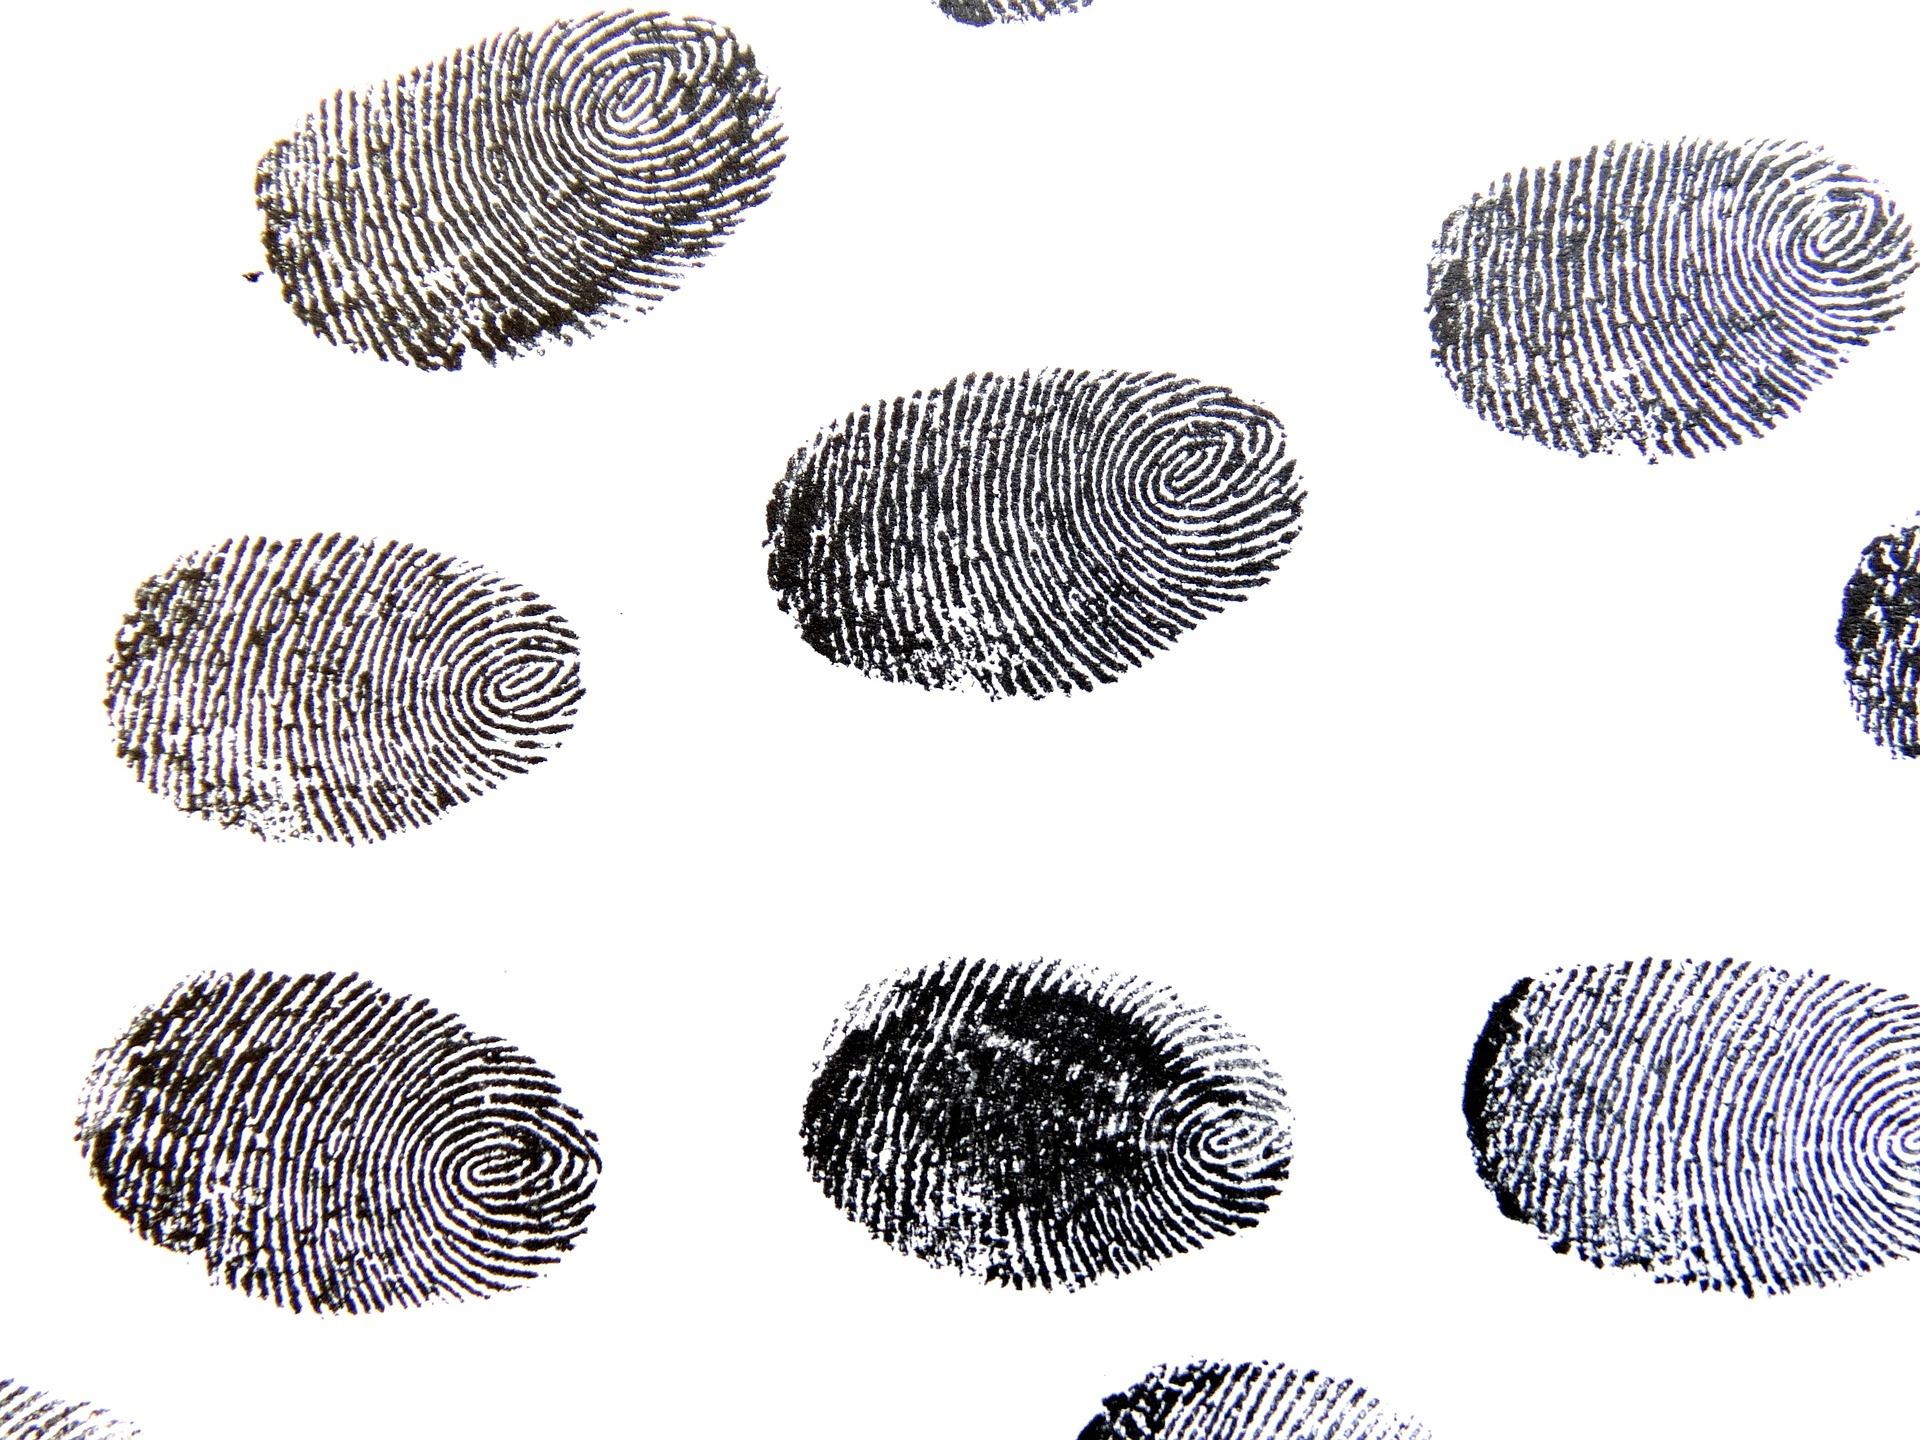 fingerprint in the Bible